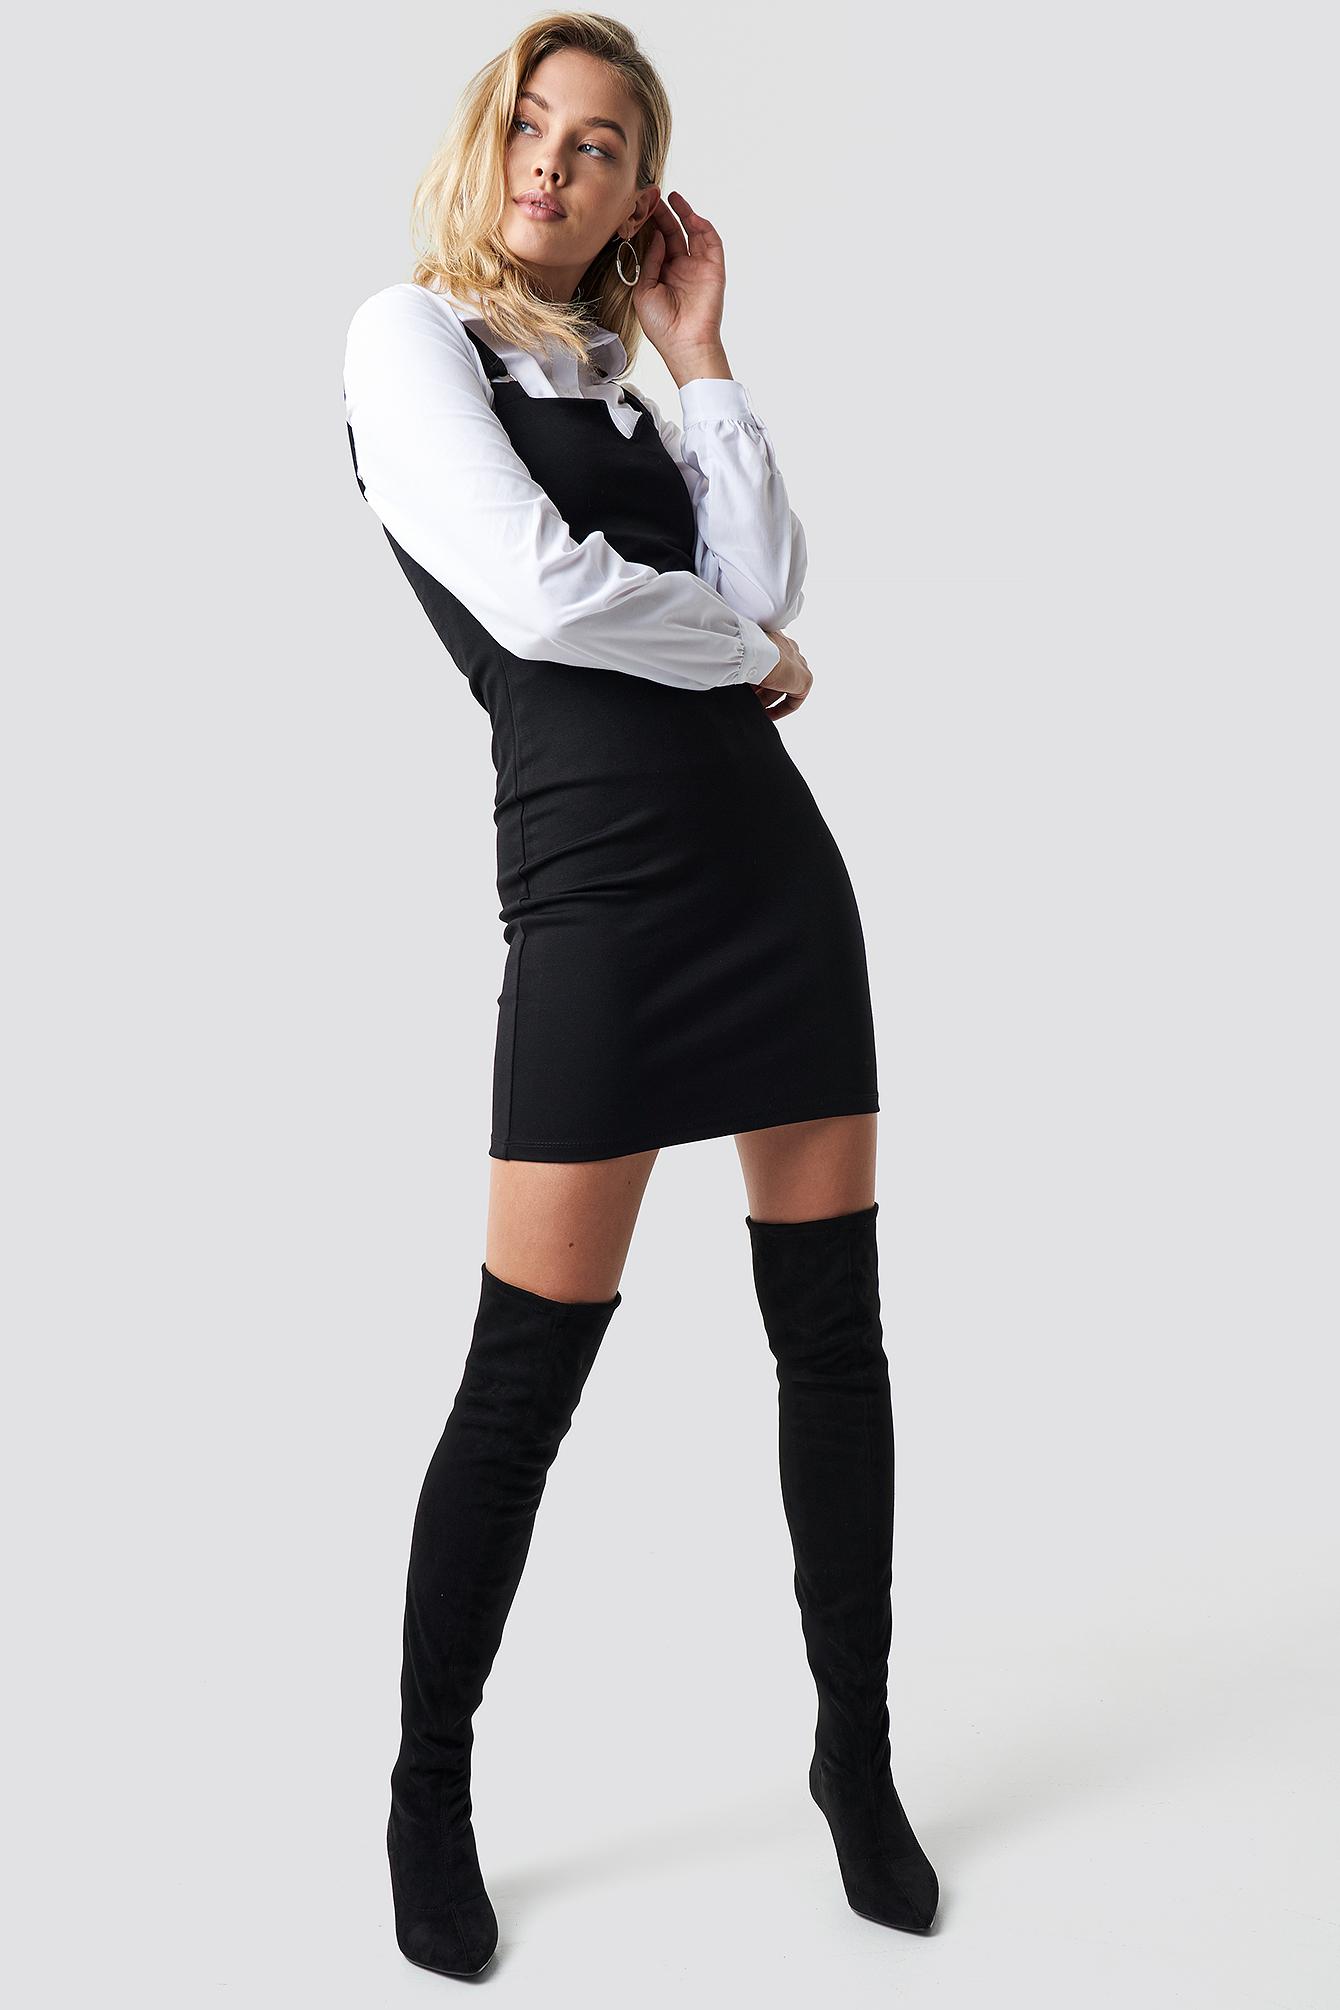 Strap Detail Dress NA-KD.COM